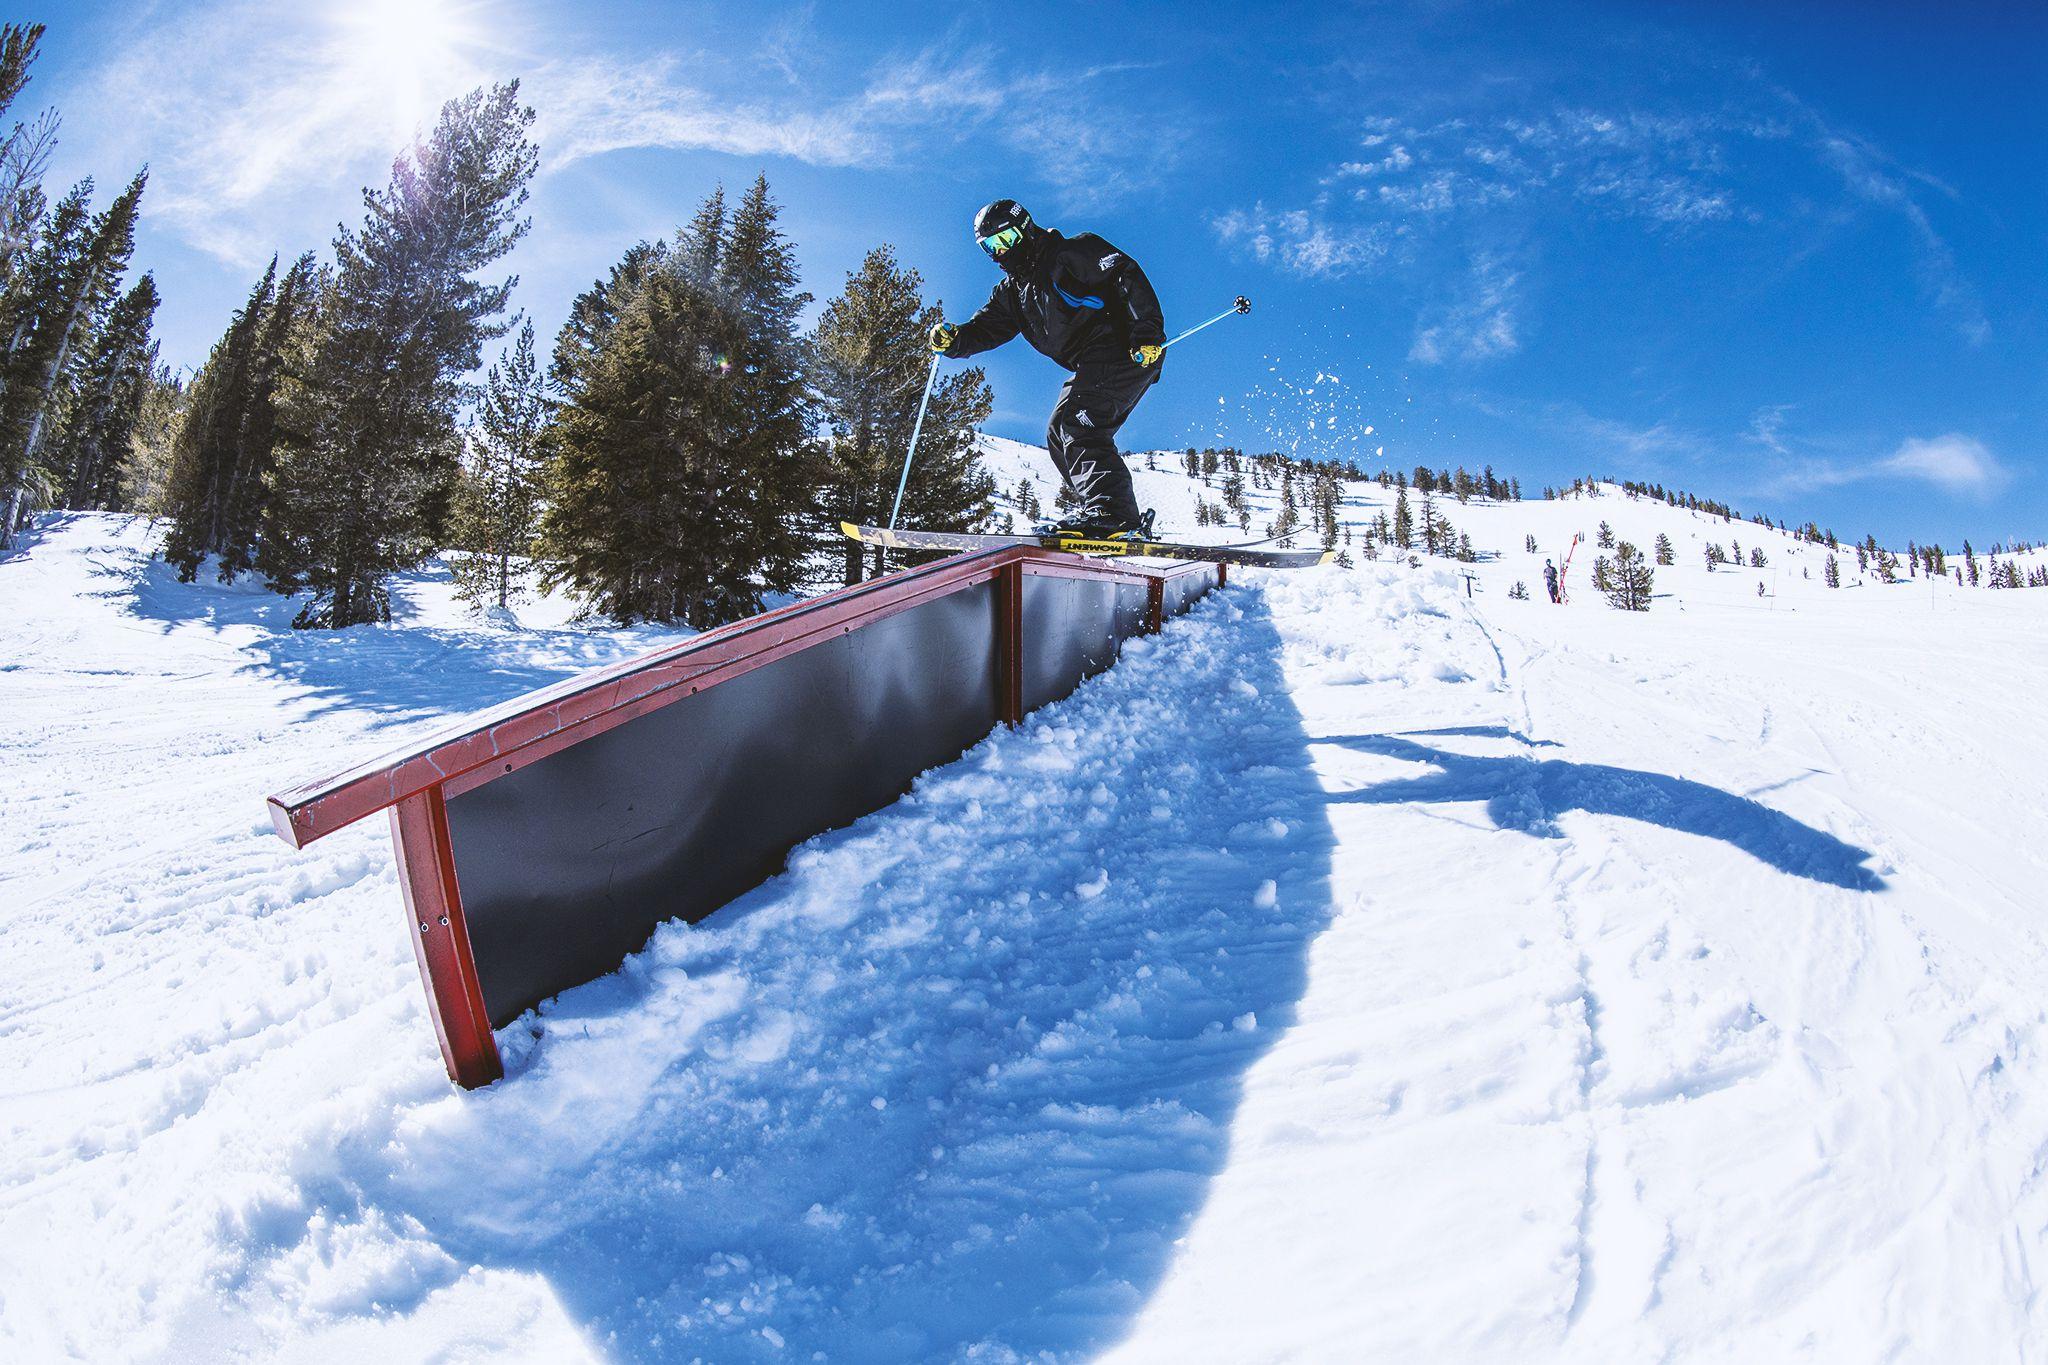 mt. rose ski area - skiing and snowboarding at mt. rose ski area